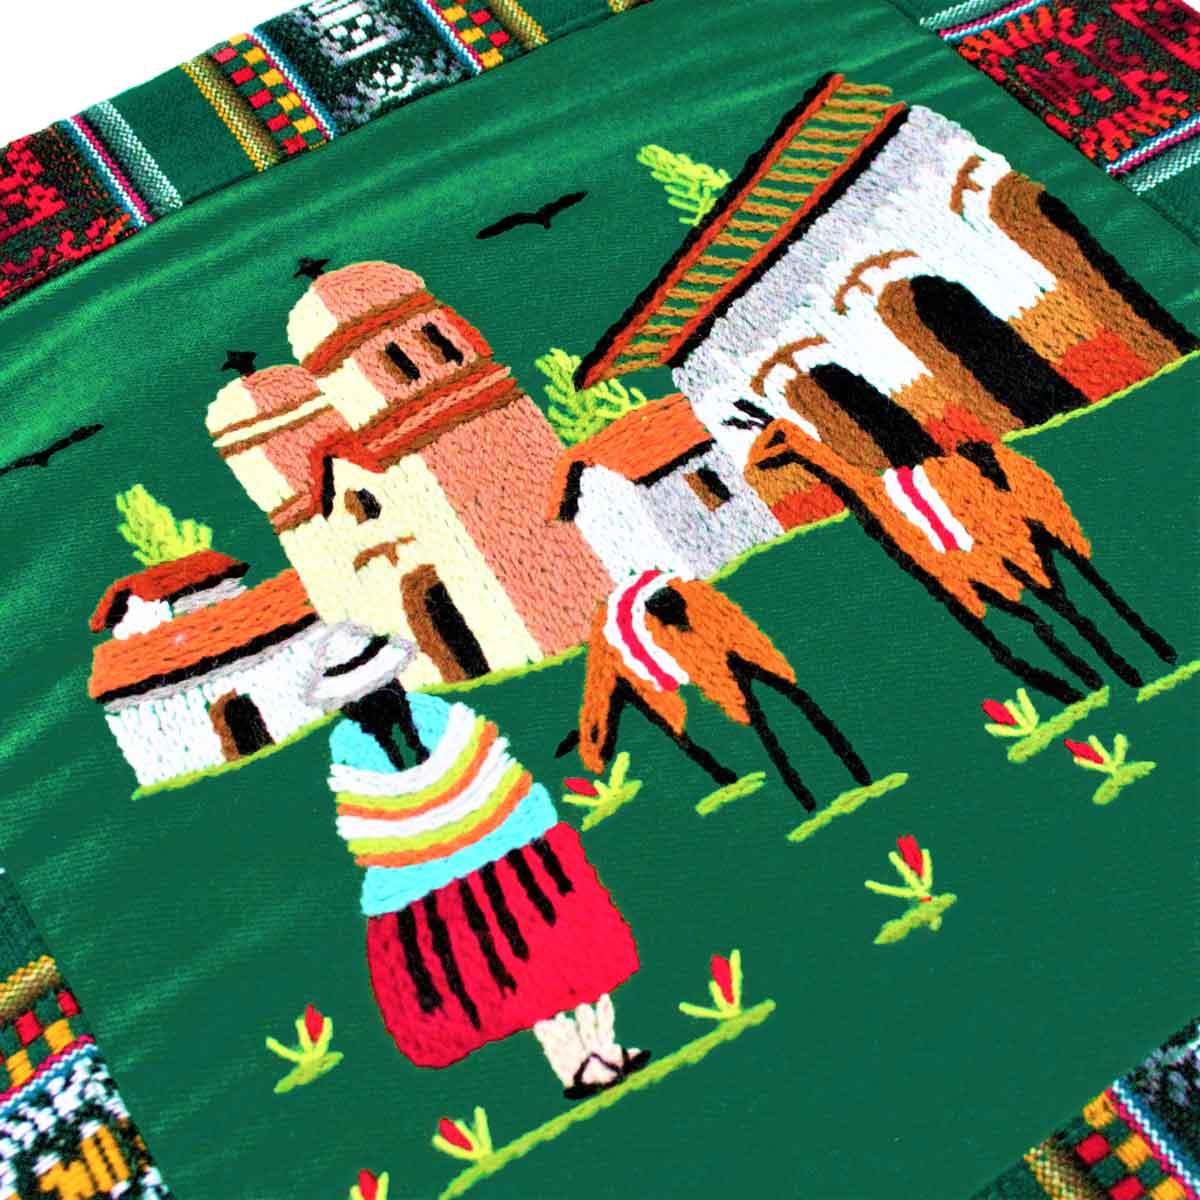 Inka-Products-Housse Coussin Péruvienne-Verte Foncée Pueblo Andino-2